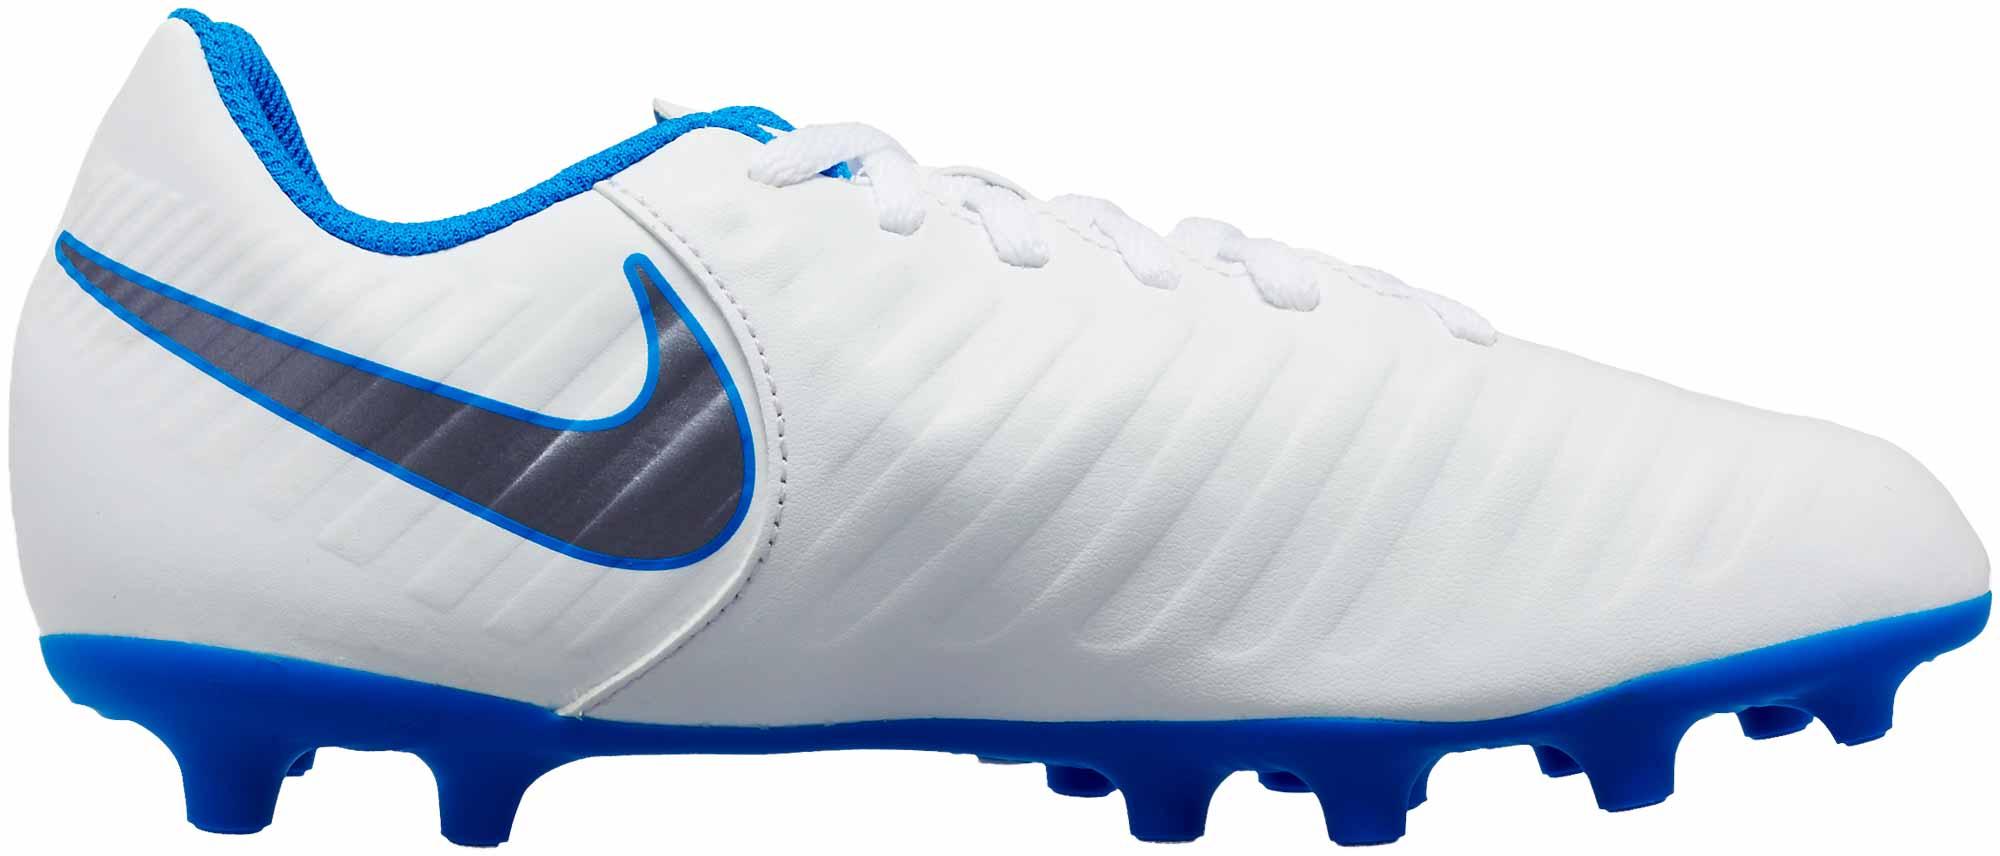 67a2e86436b Nike Tiempo Legend 7 Club FG - Youth - White Metallic Cool Grey Blue ...